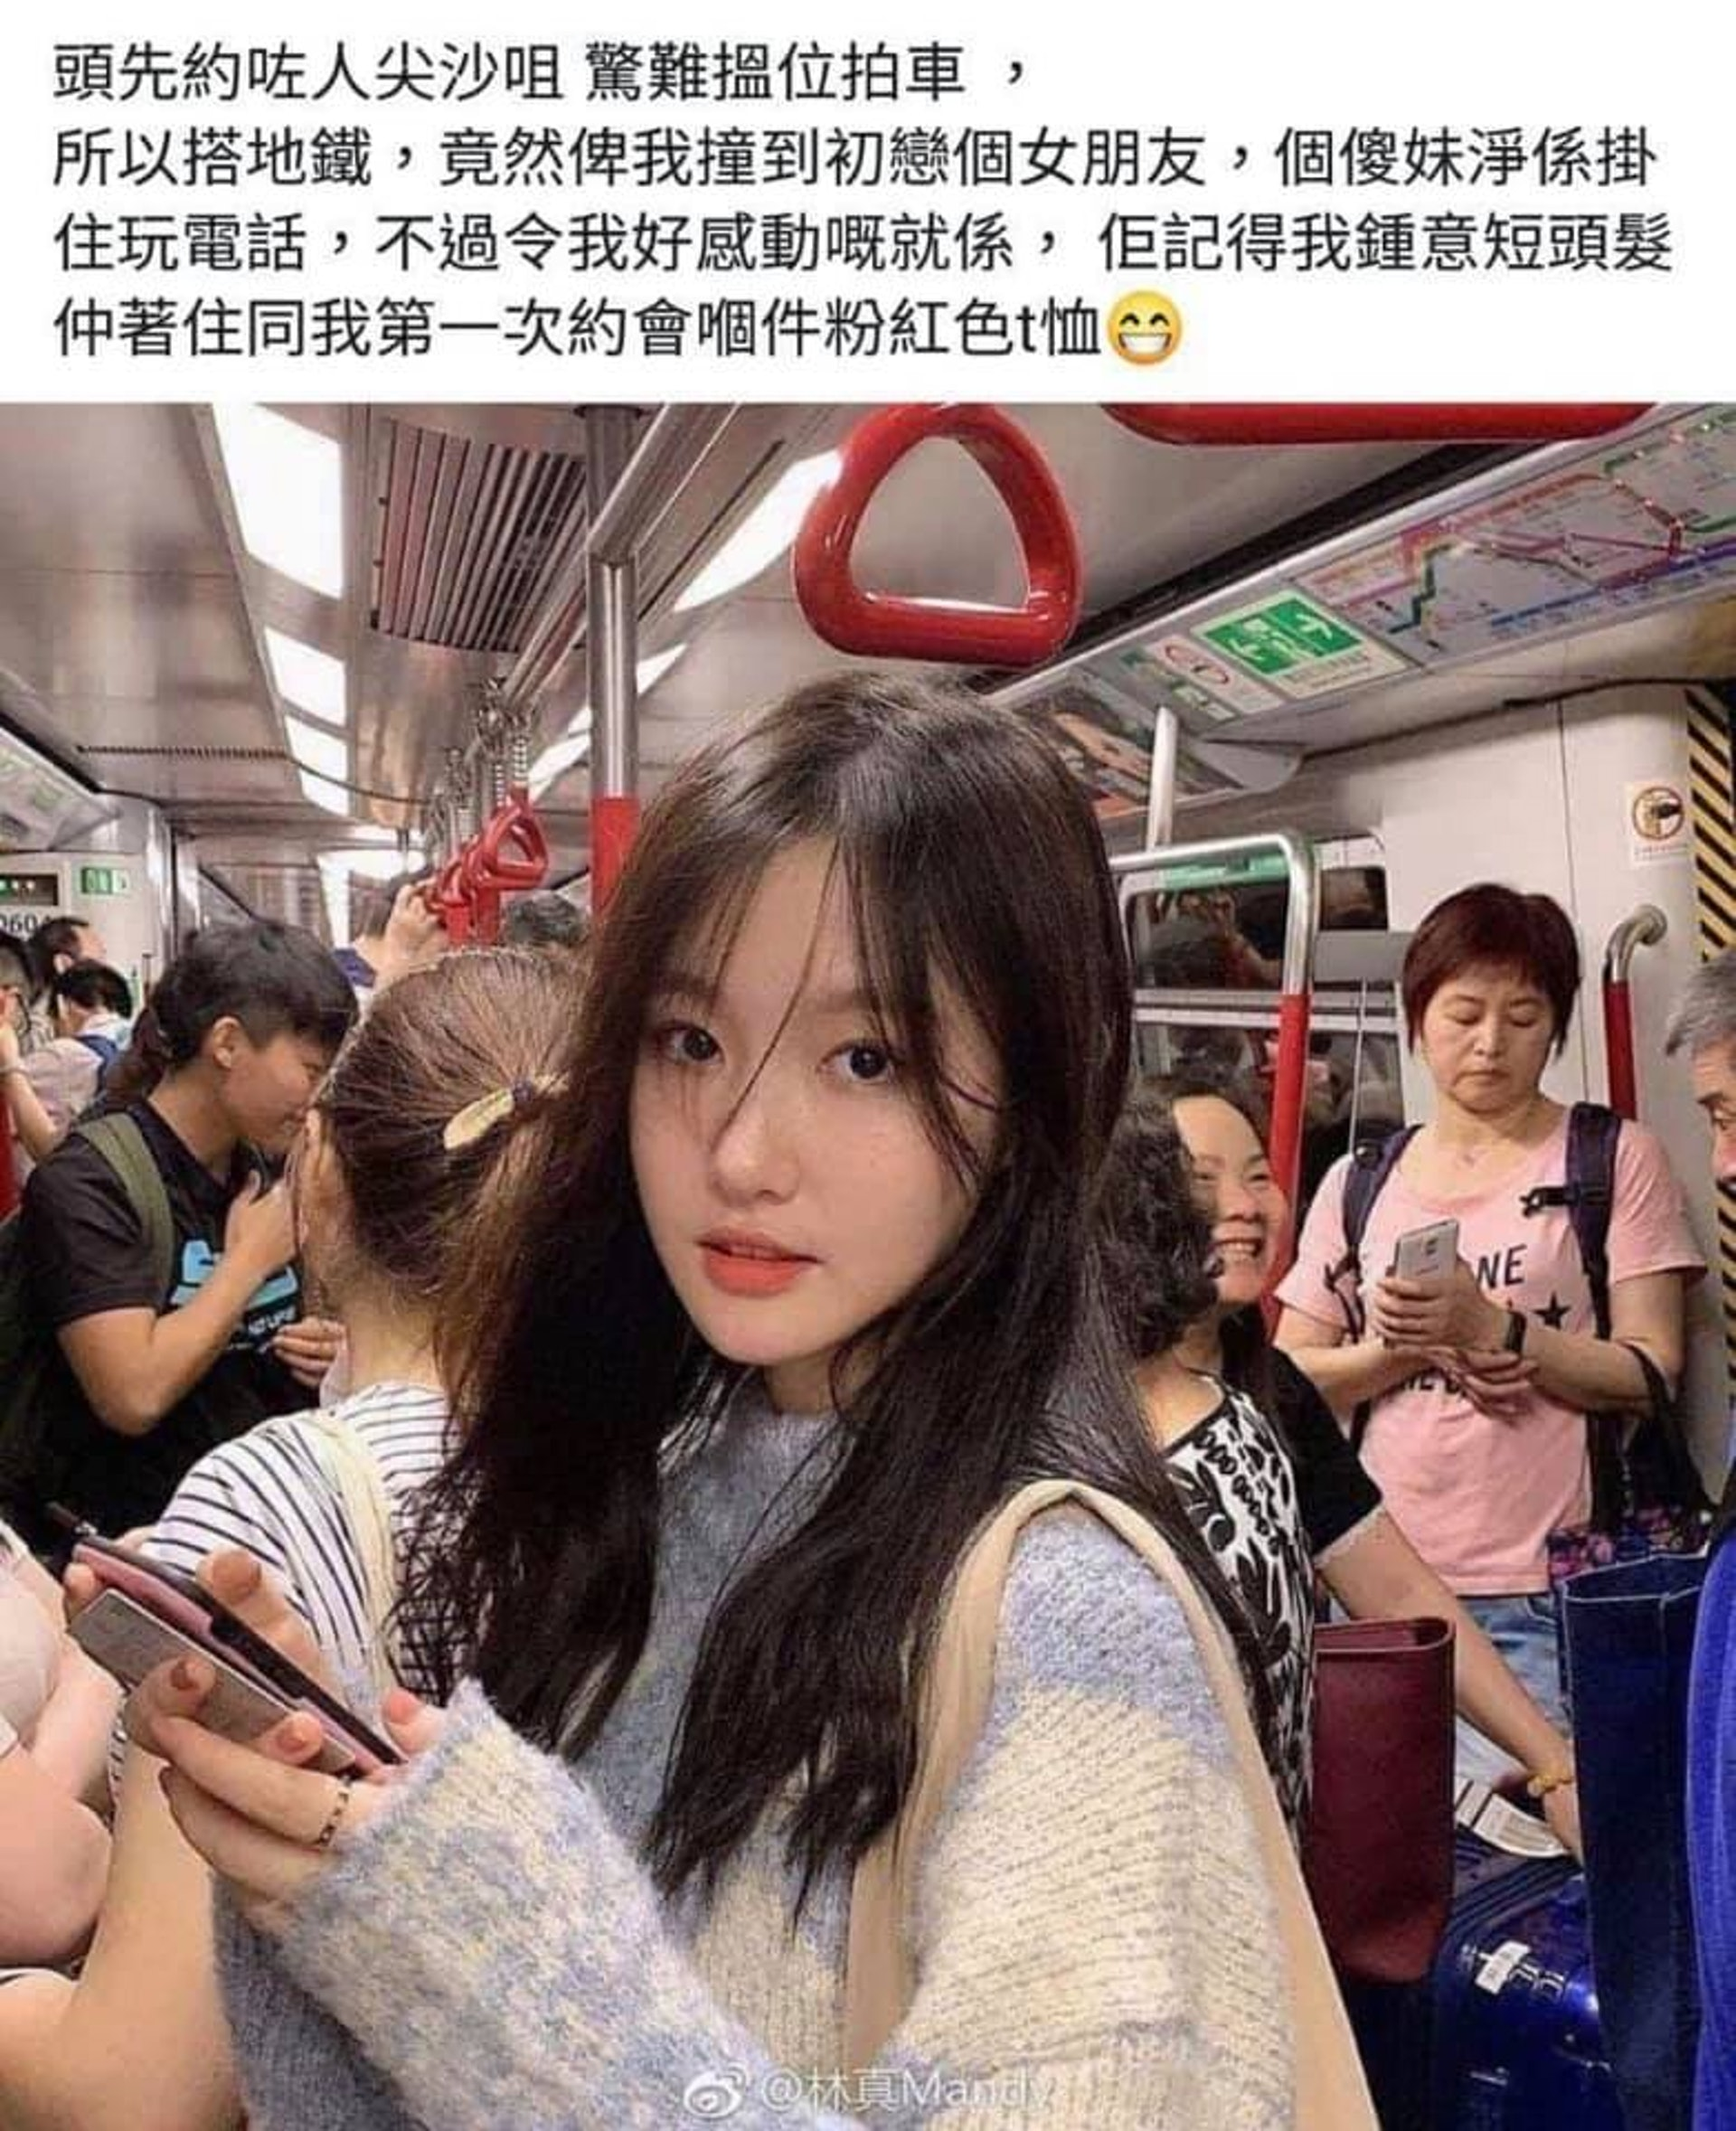 fb近日瘋傳一張截圖,帖文聲稱乘港鐵時碰到初戀女朋友,根據形容相信是右後方的一名短髮女士。不過大部分人都「錯重點」,留意到站在鏡頭最前方的長髮年輕女生。(fb截圖)